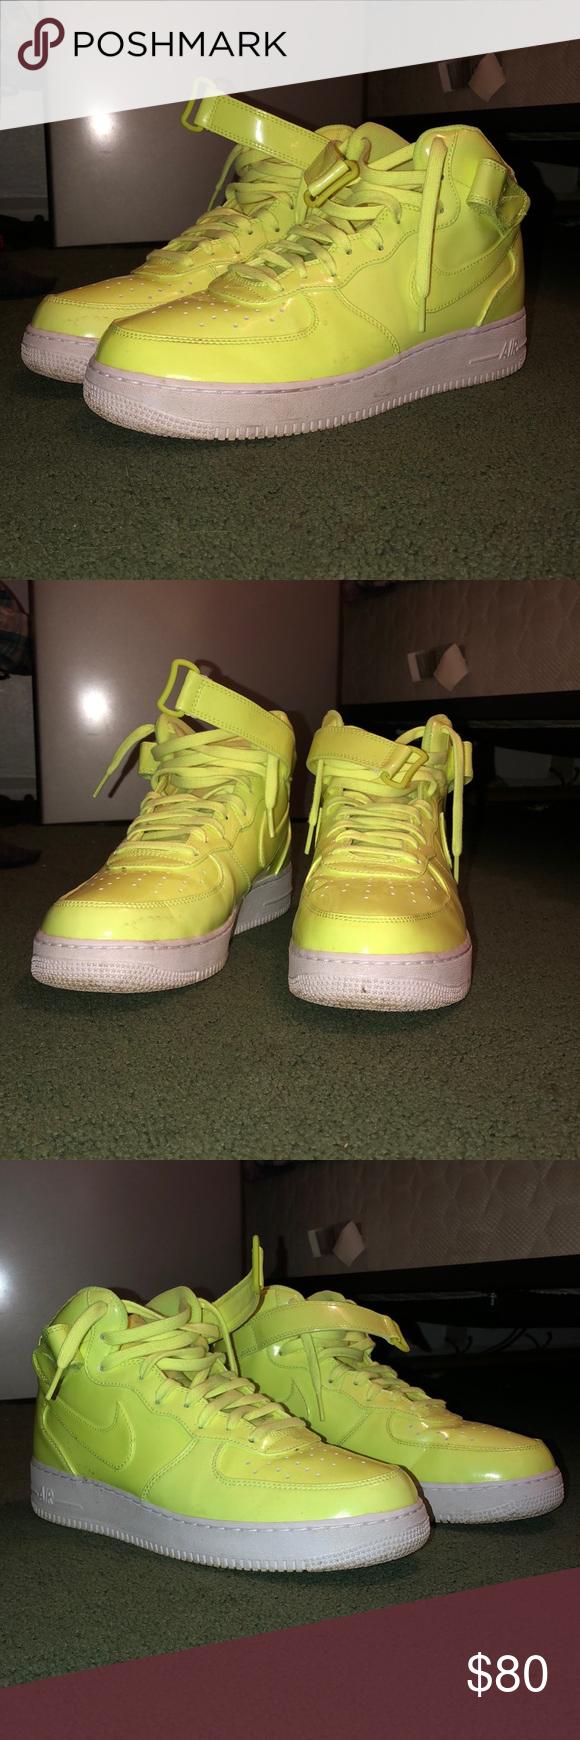 highlighter yellow nikes